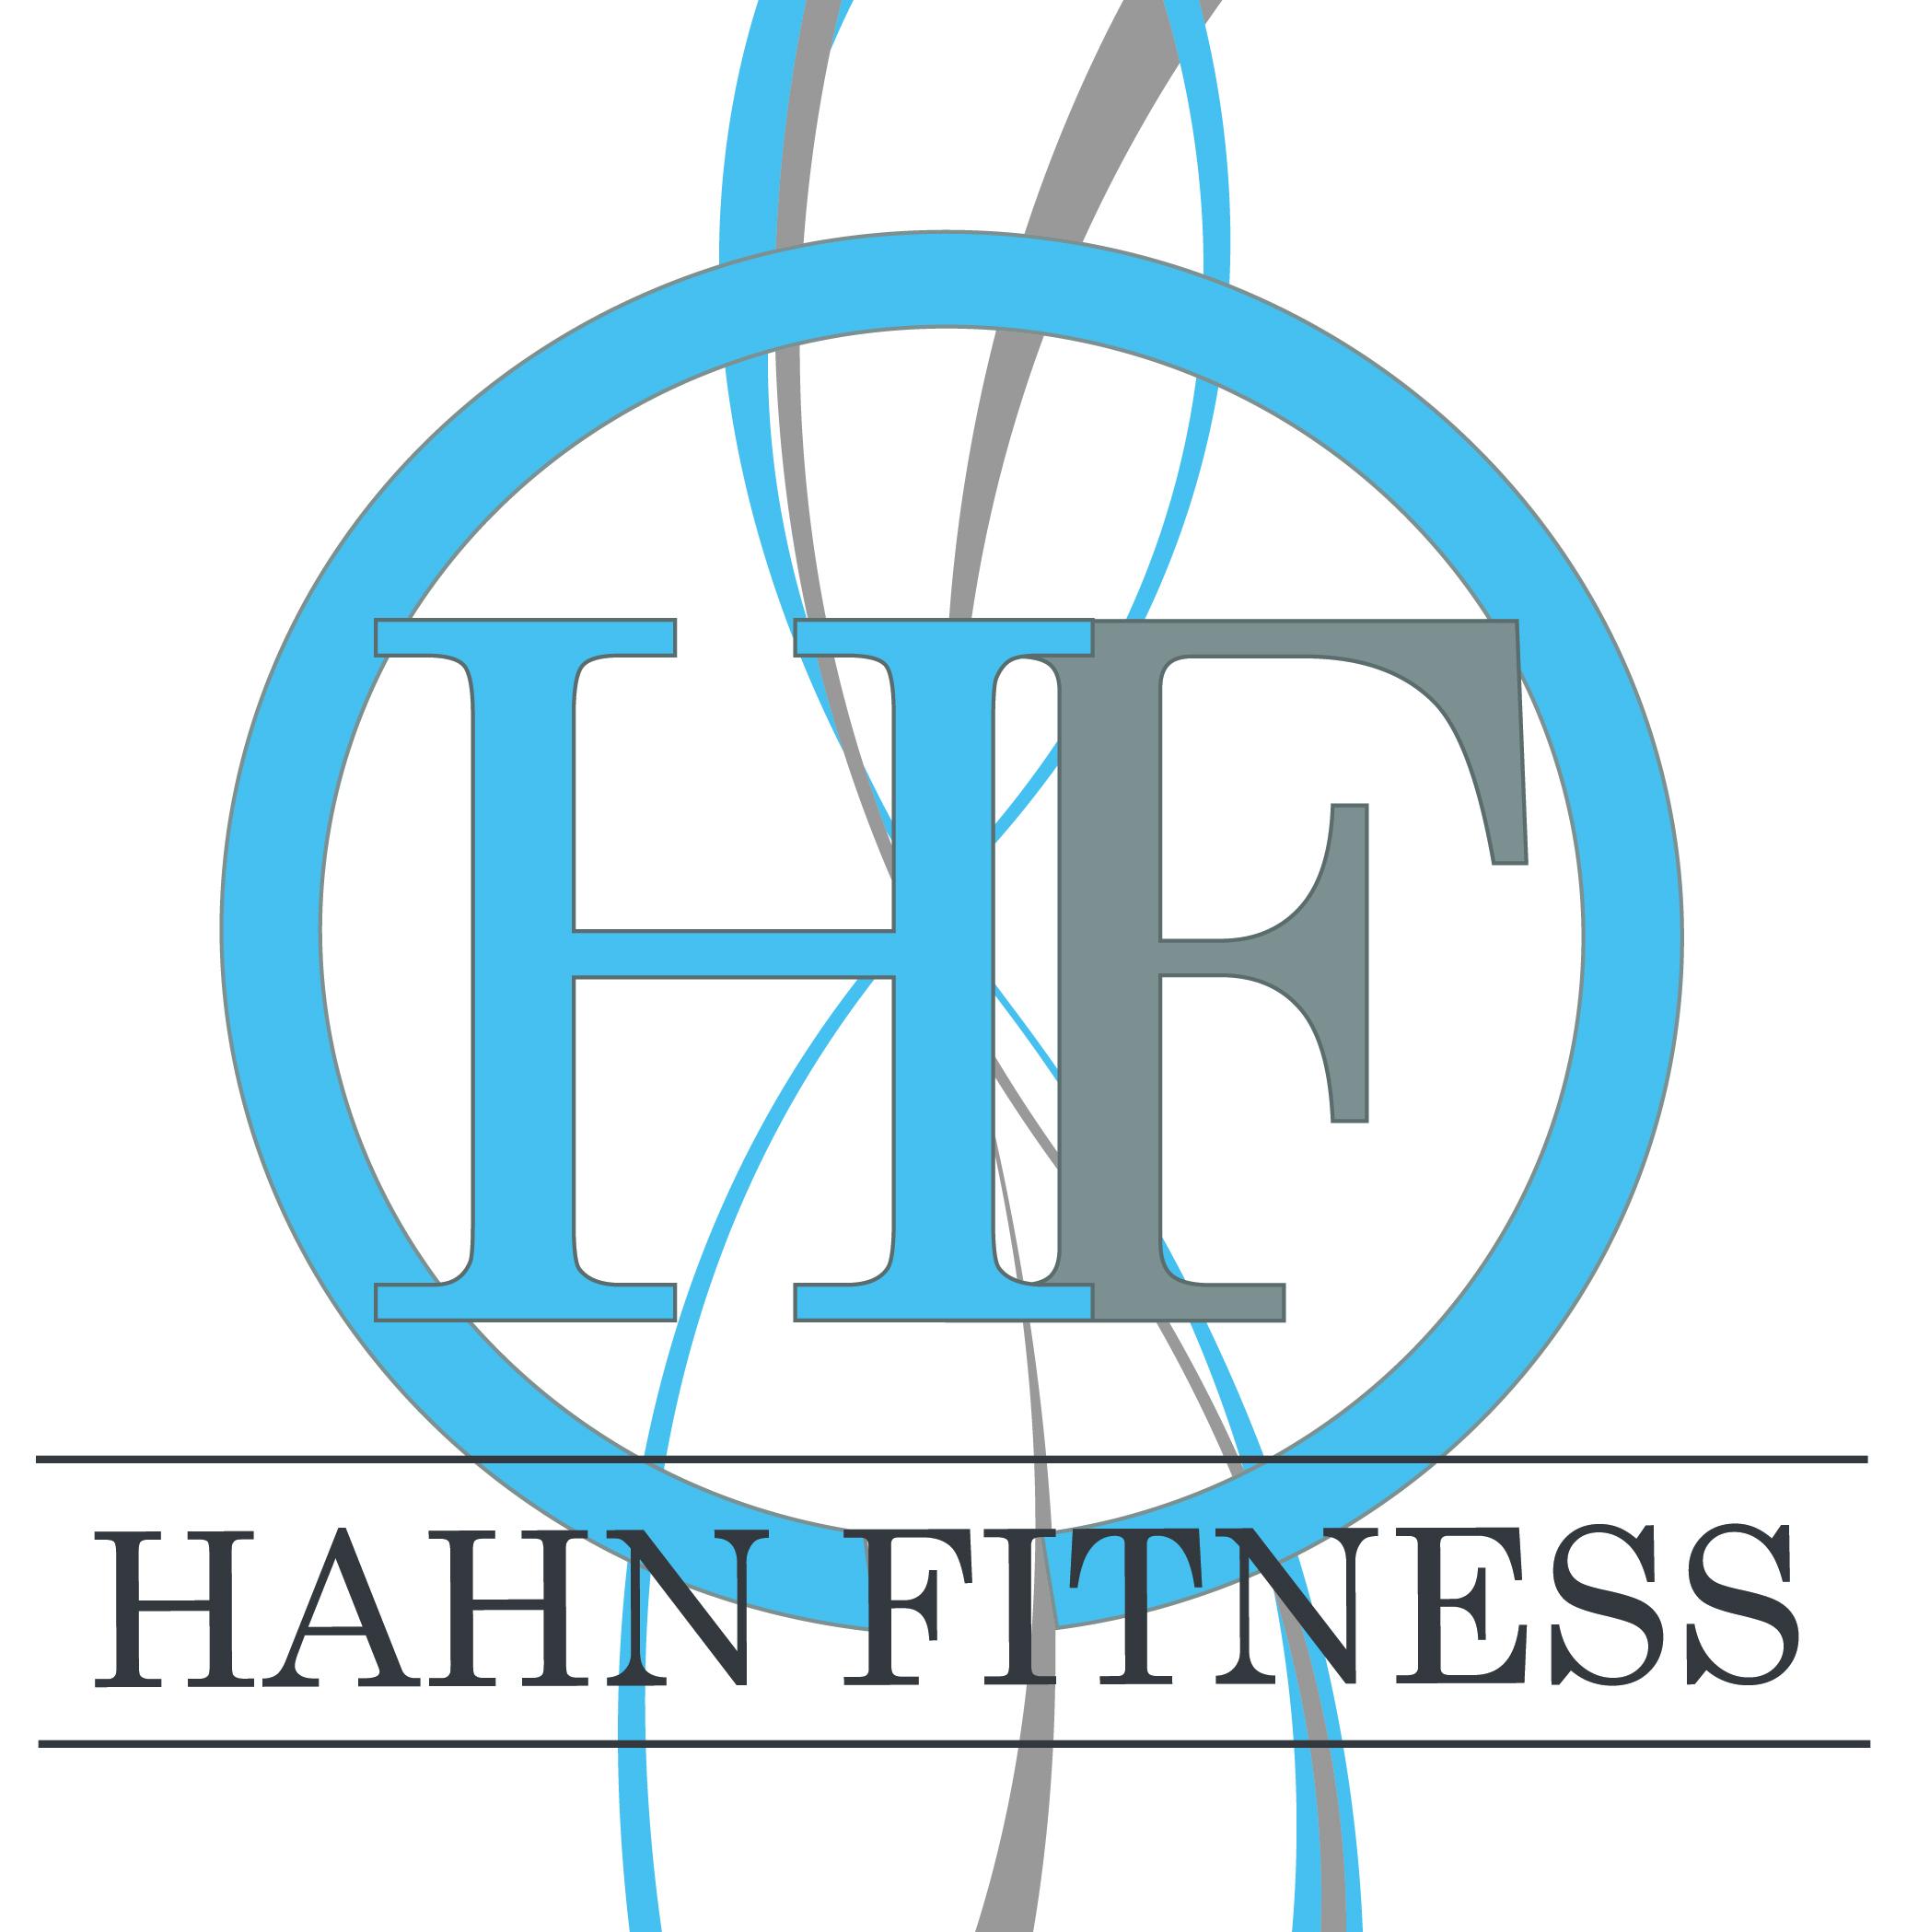 Hahn Fitness